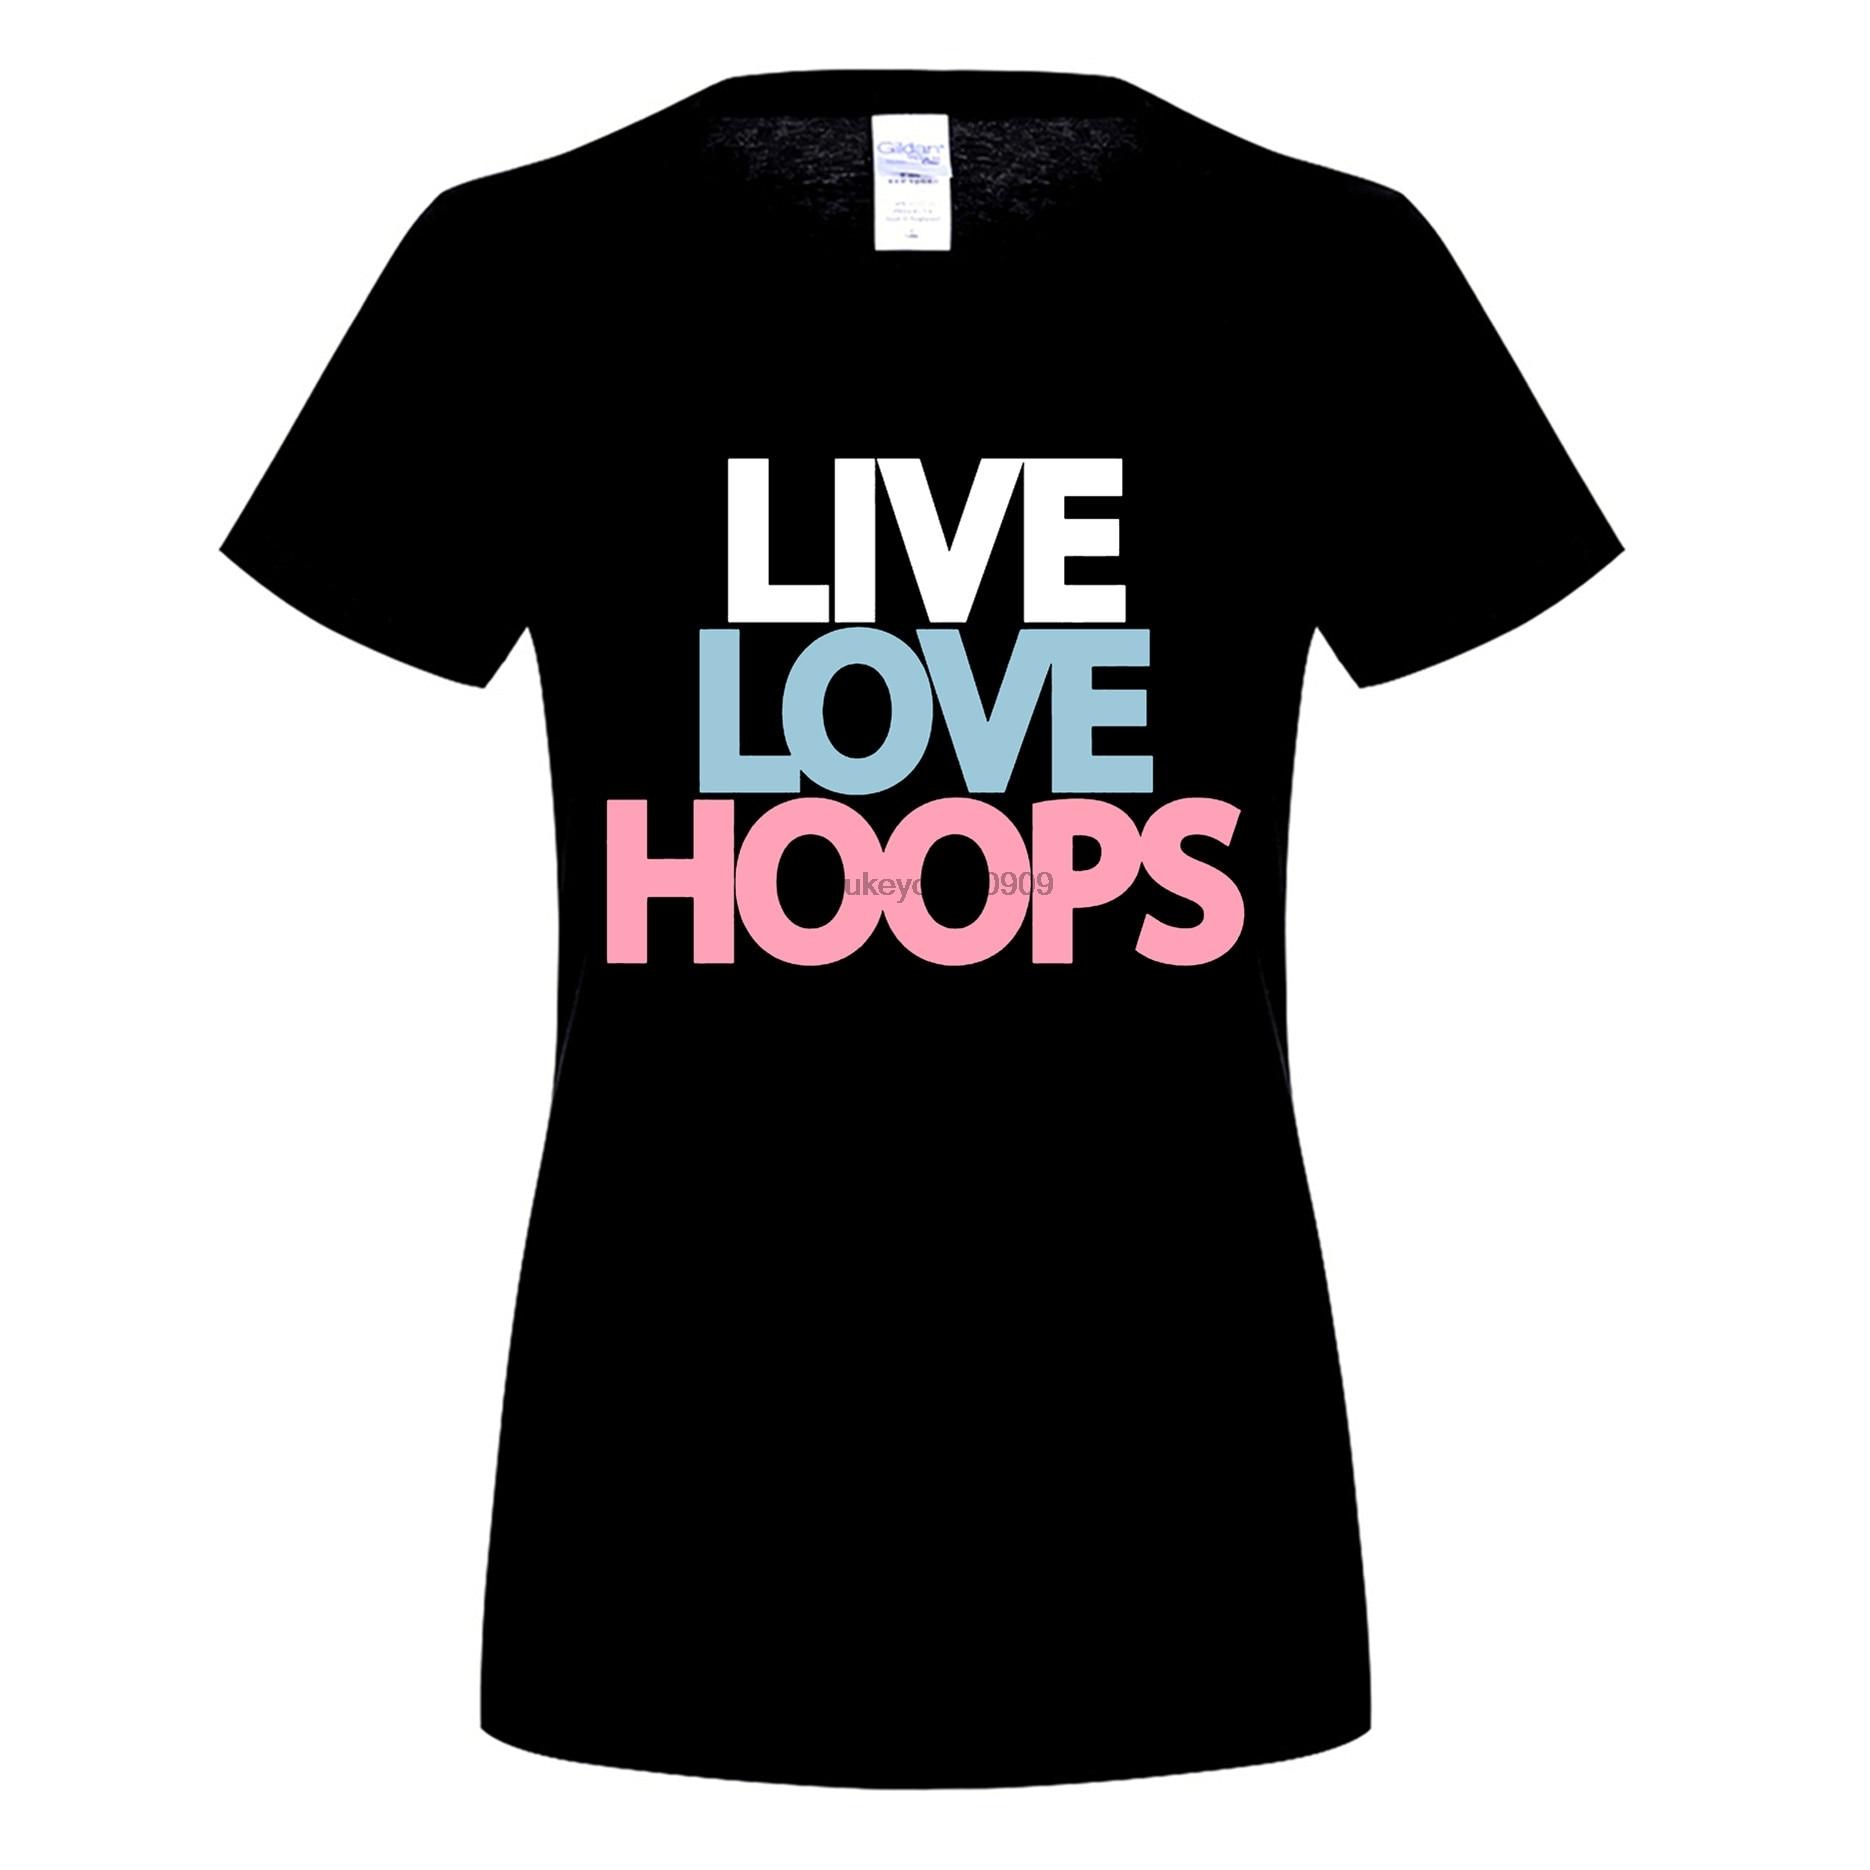 GILDAN Basketballer Live Love Hoops s T-Shirt Summer Funny Print Fe T-Shirts Slim Funny Fashion Cotton Casual Shirt